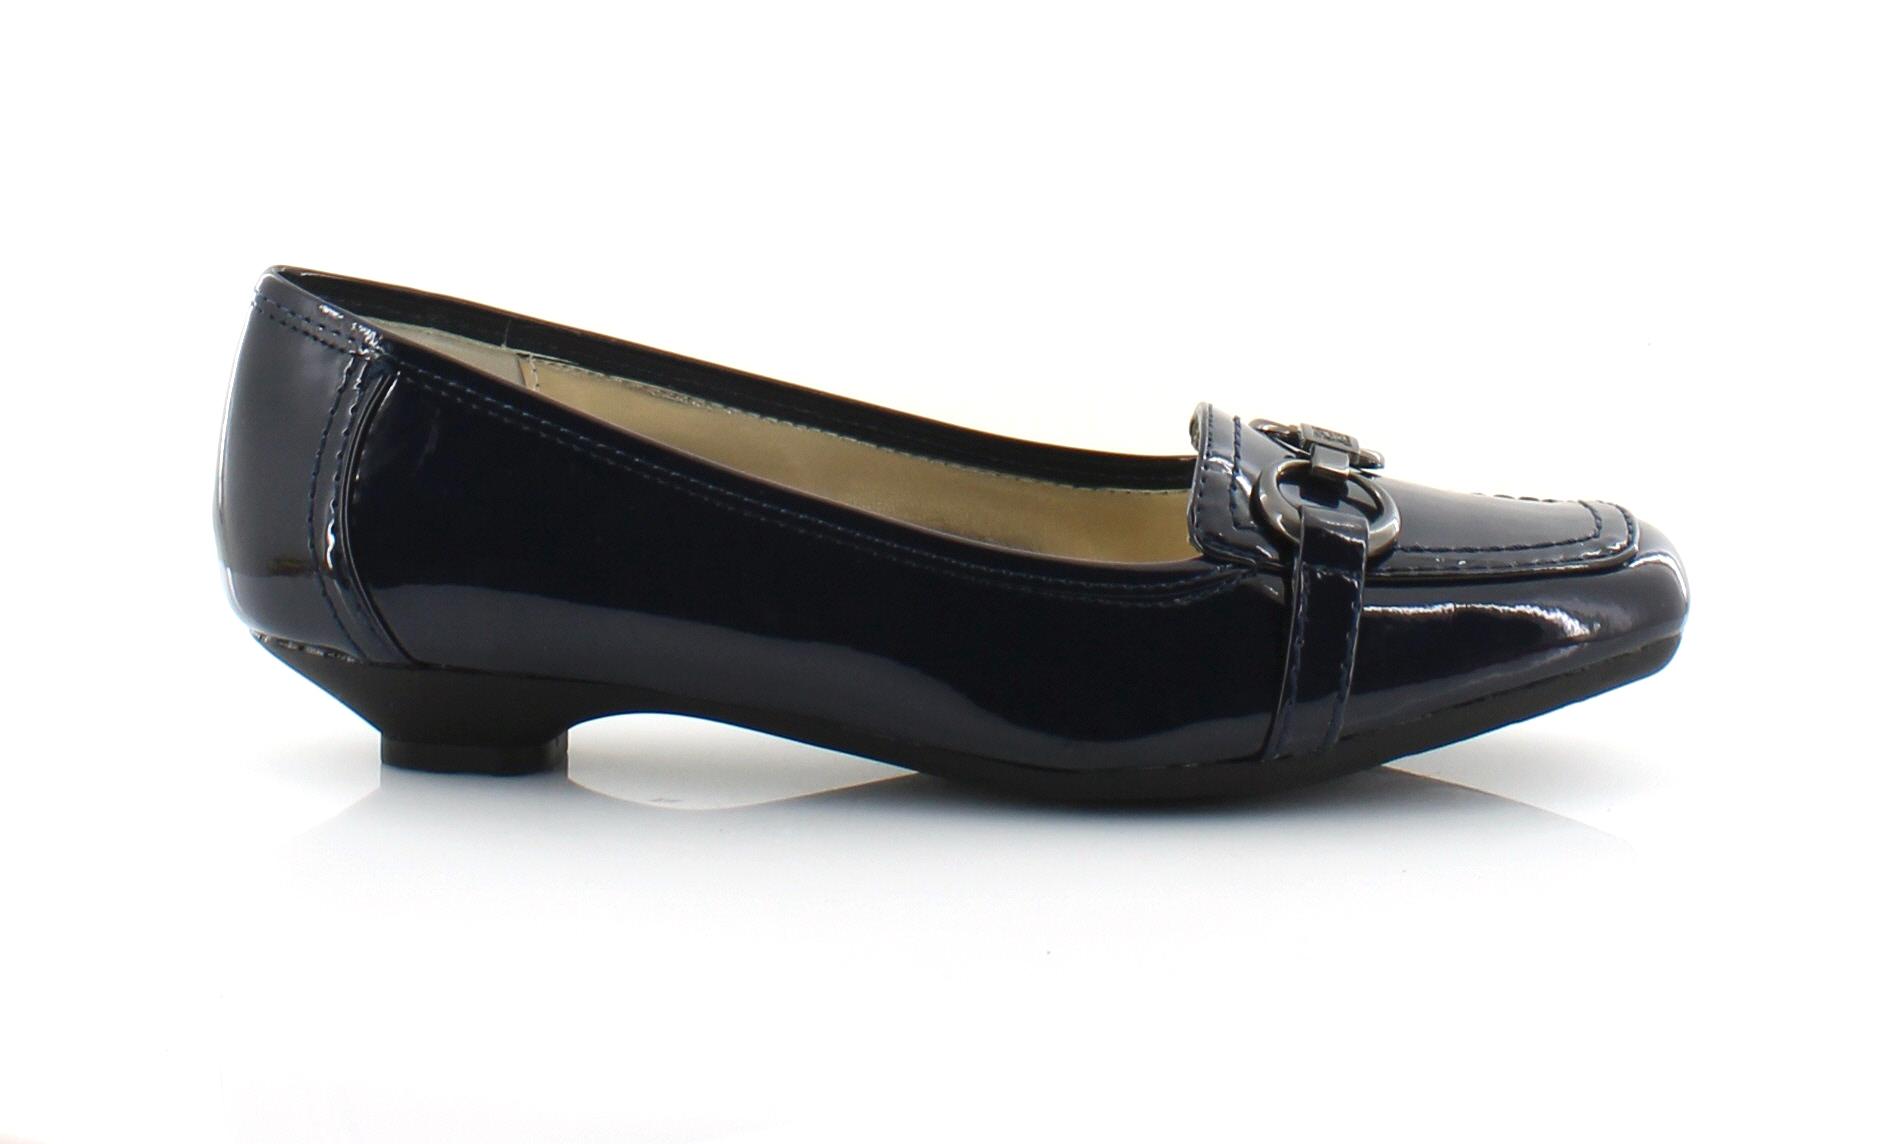 Details about Anne Klein Joleen Blue Womens Shoes Size 7.5 m Flats